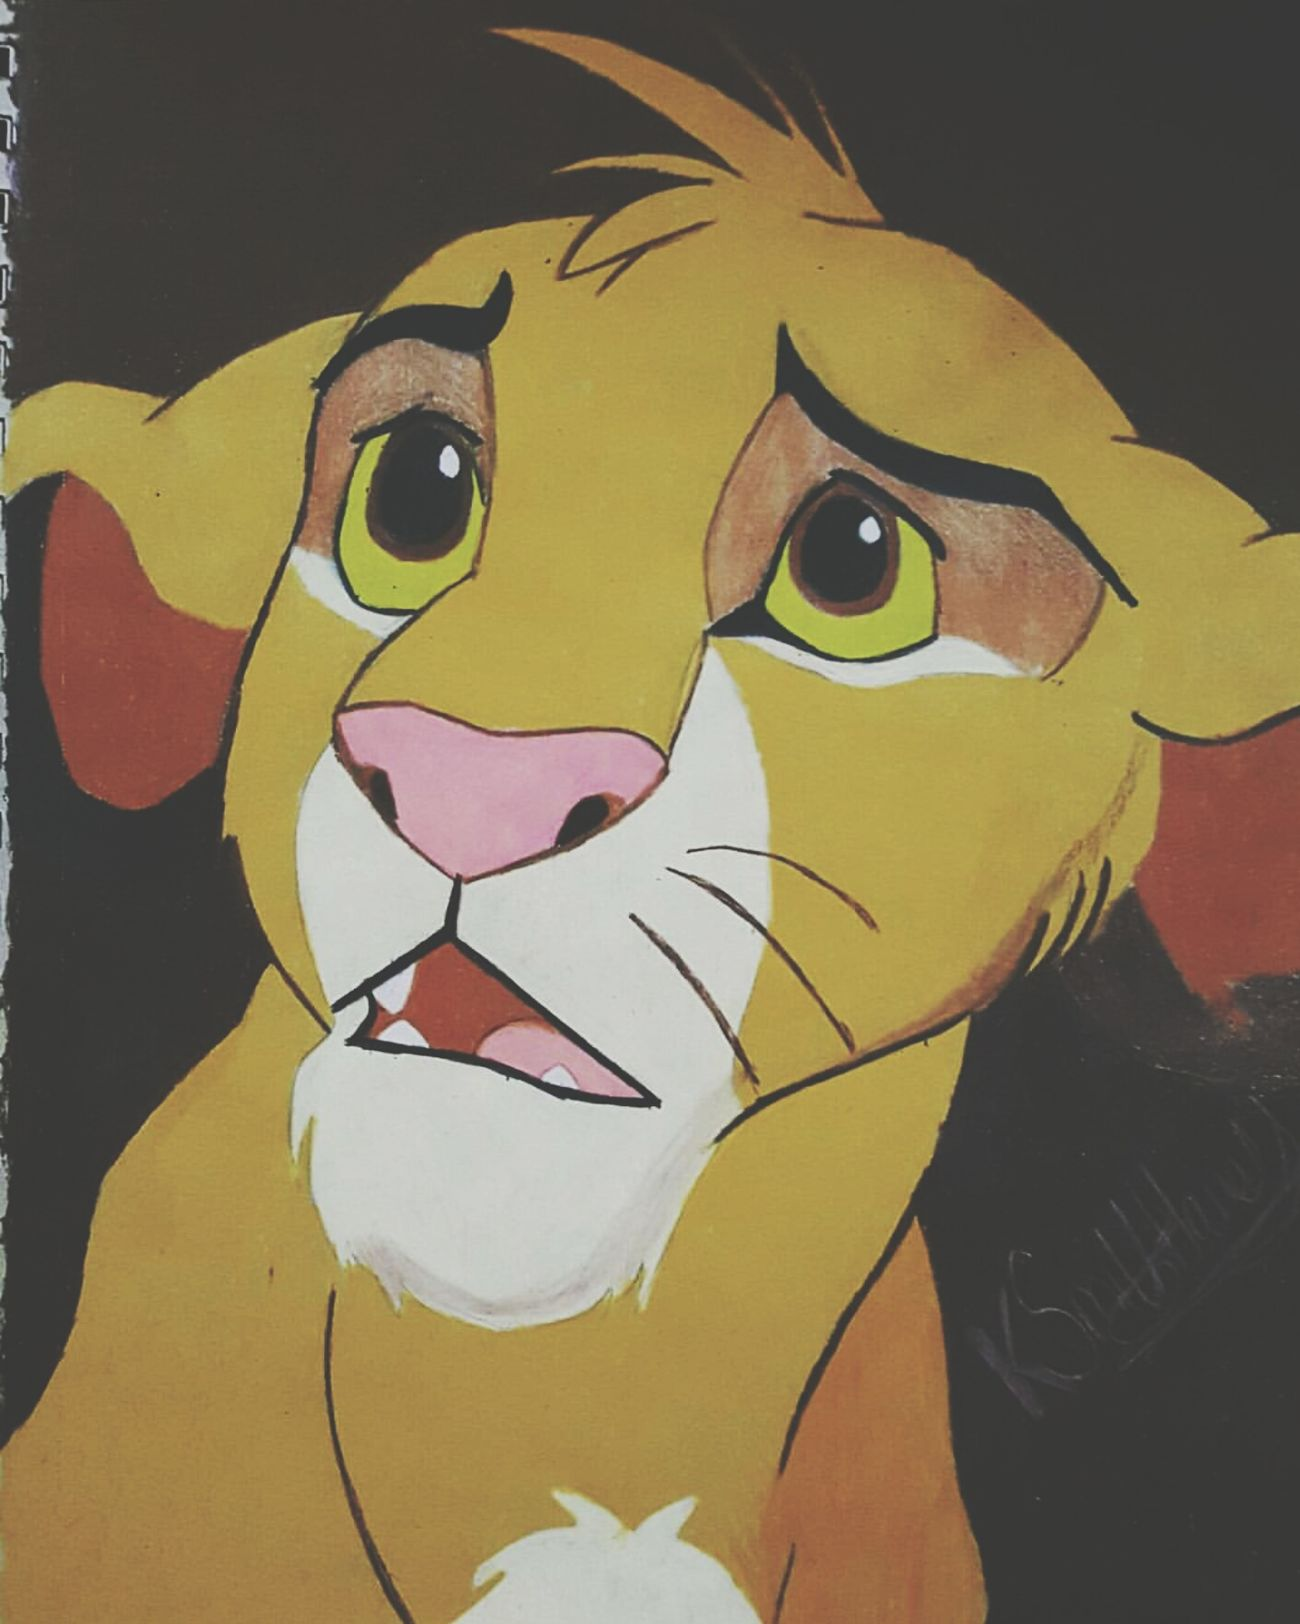 ArtWork Art, Drawing, Creativity Art And Craft Drawing Simba Thelionking The Lion King Disneyland Disney DisneyMagic  Artistic Artist